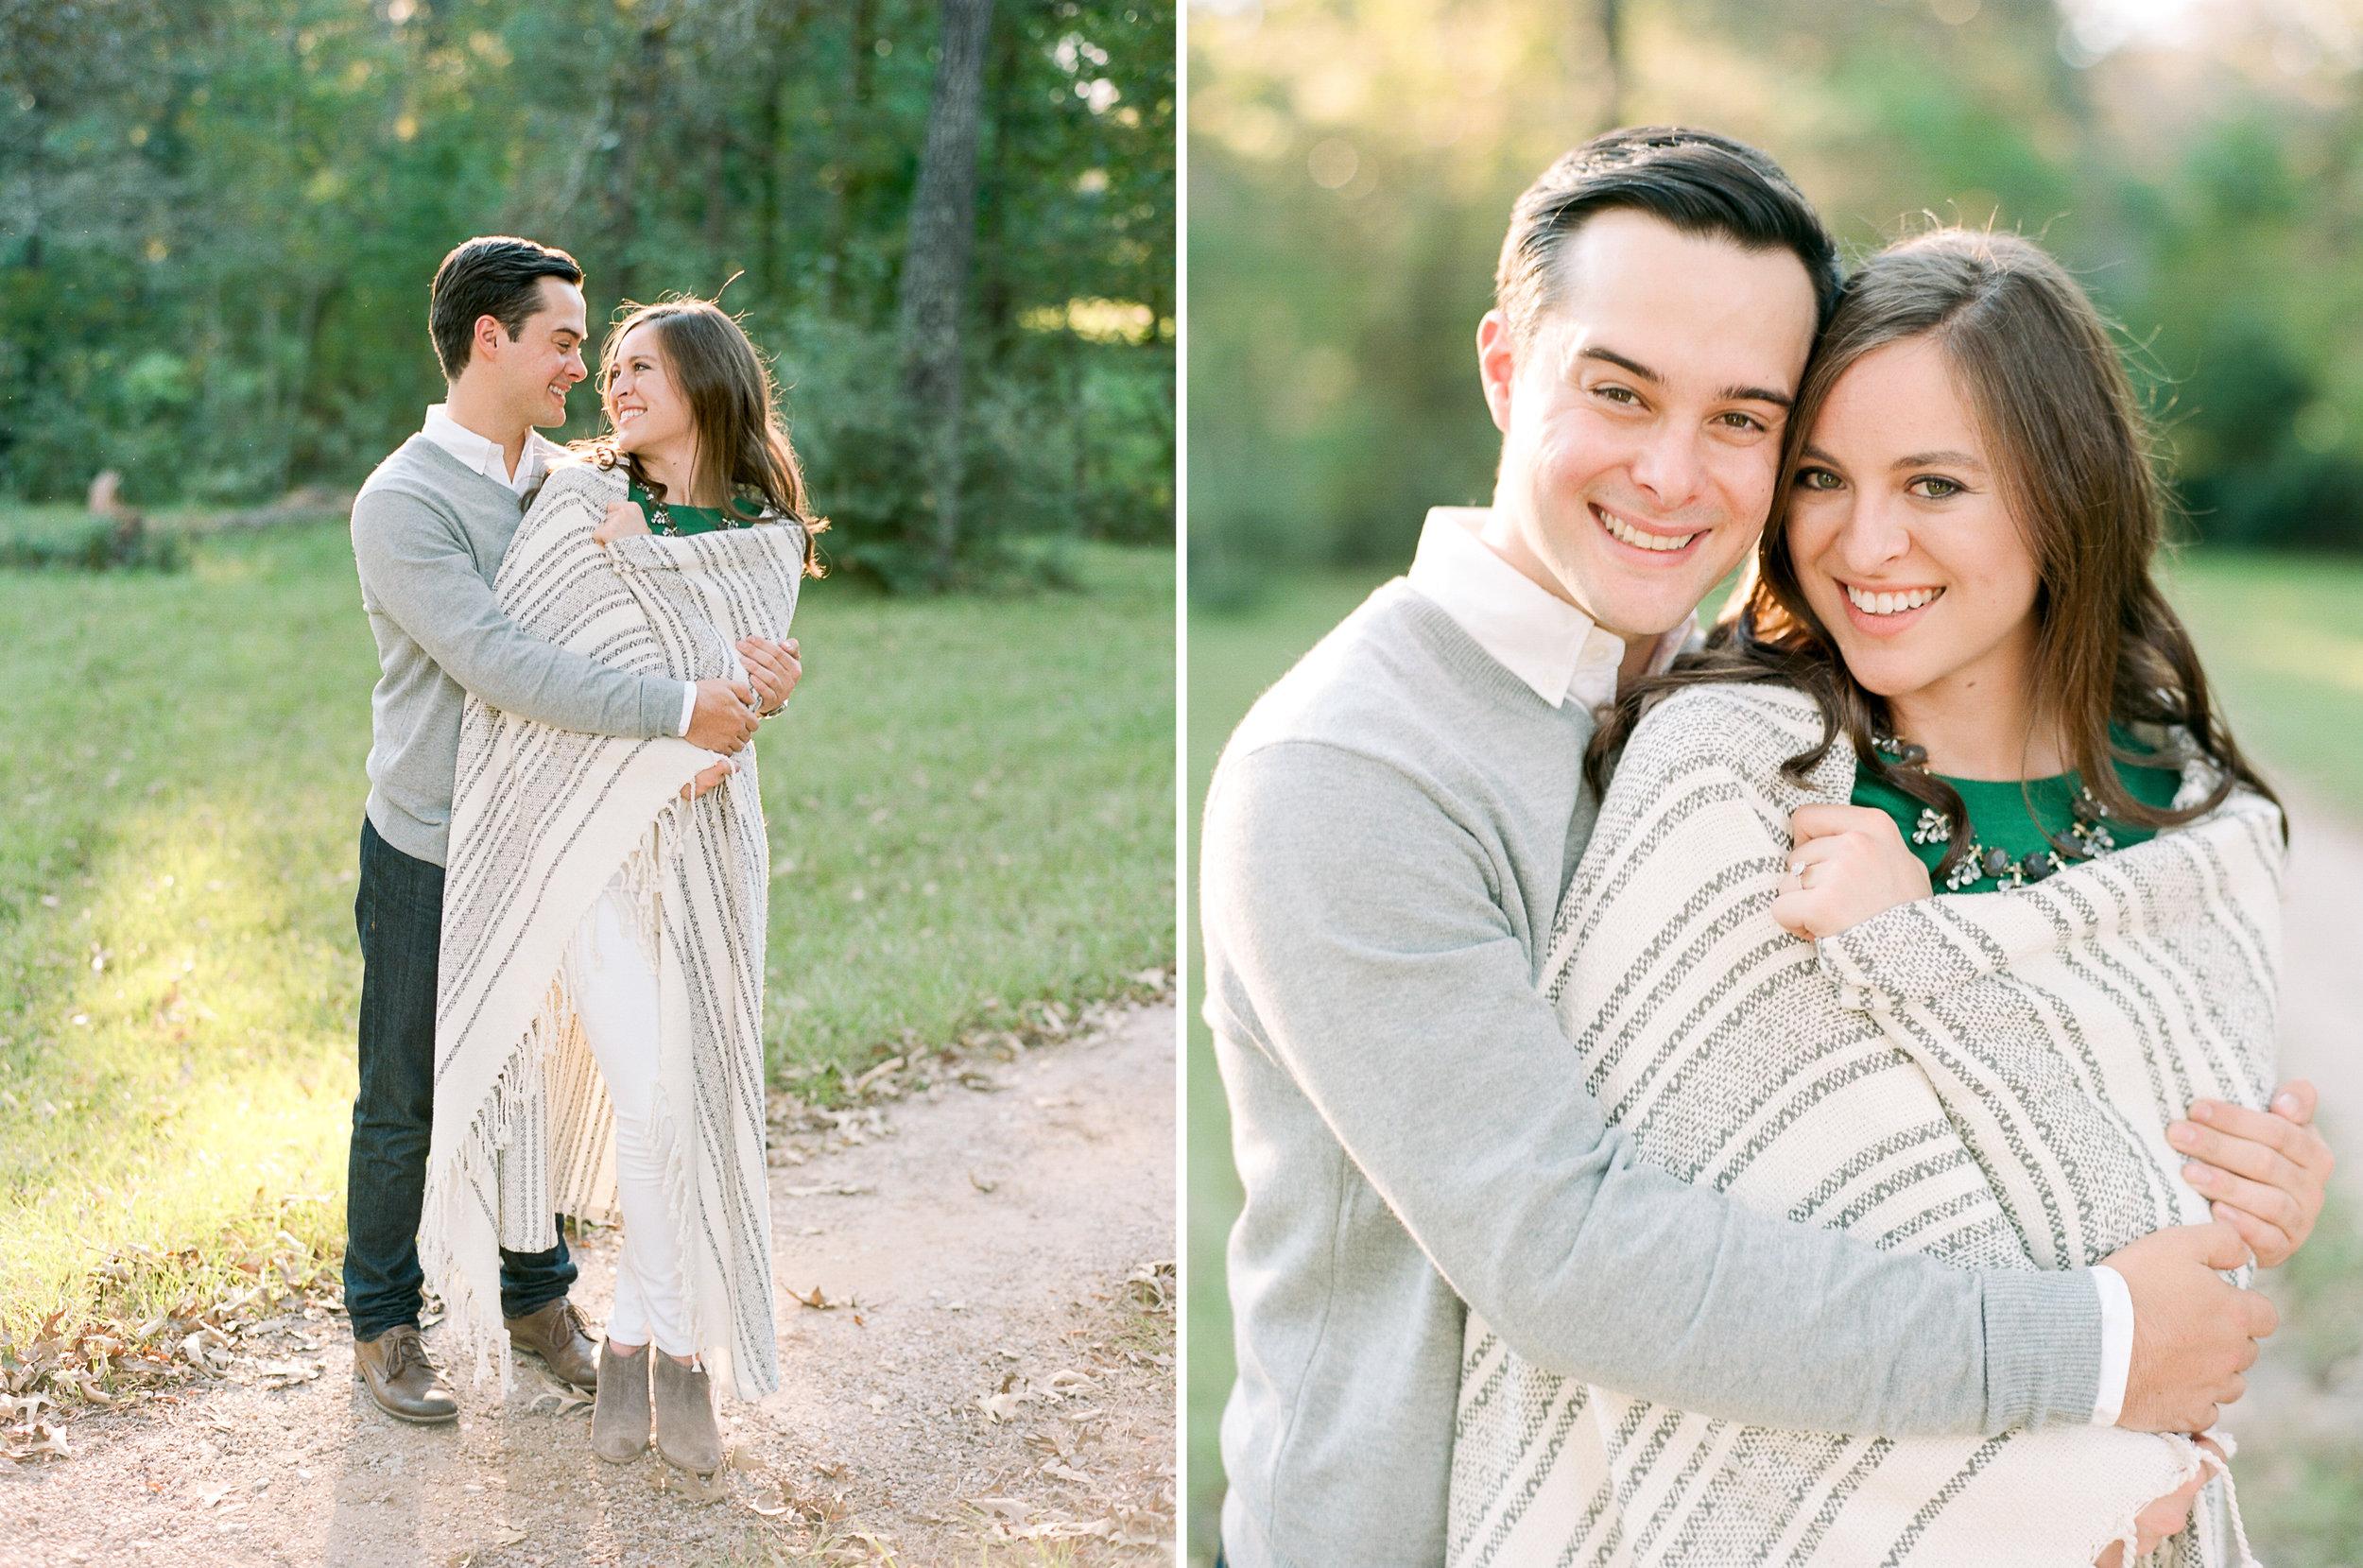 houston-wedding-photographer-college-station-austin-the-woodlands-film-photography-style-me-pretty-engagements-dana-fernandez-photography-115.jpg